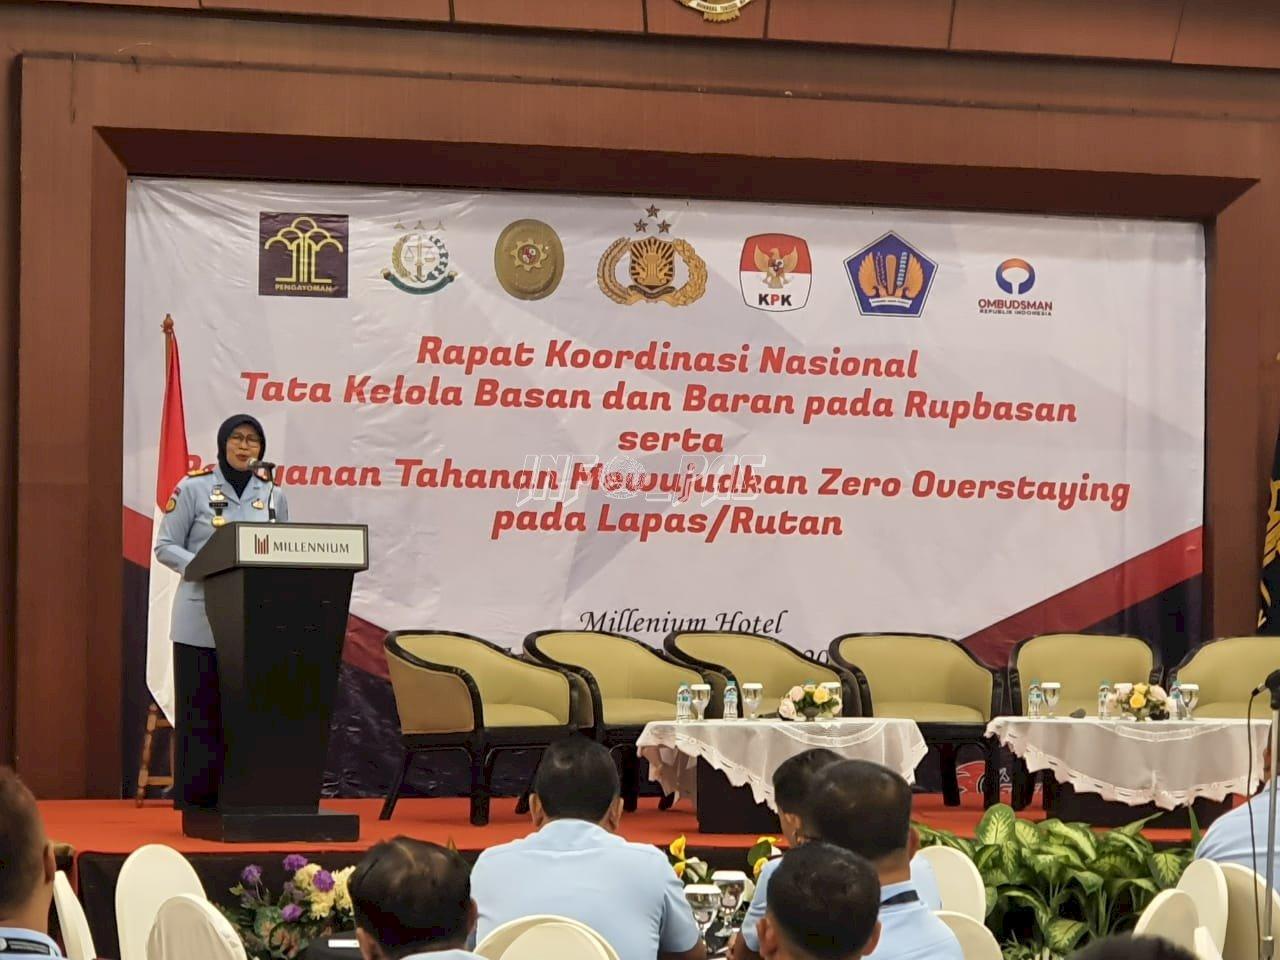 Sinergi APH, Solusi Tata Kelola Rupbasan & Overstaying di Lapas/Rutan